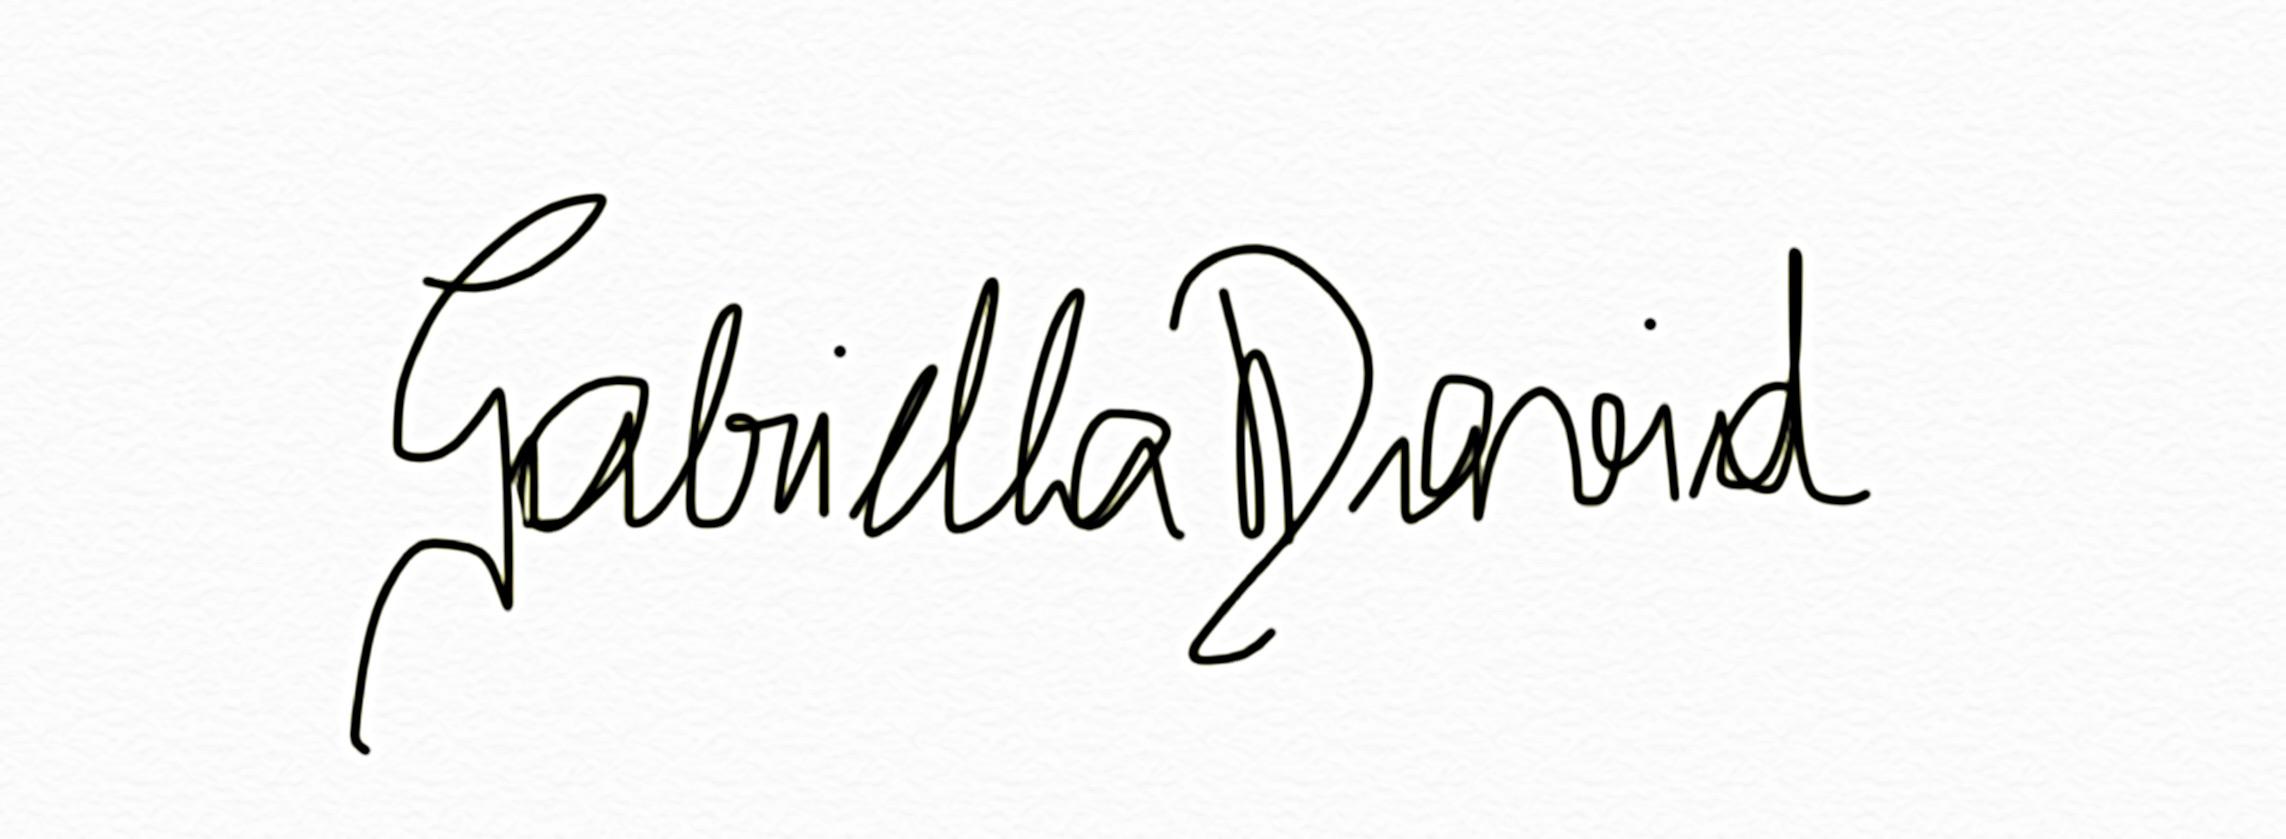 Gabriella David Signature